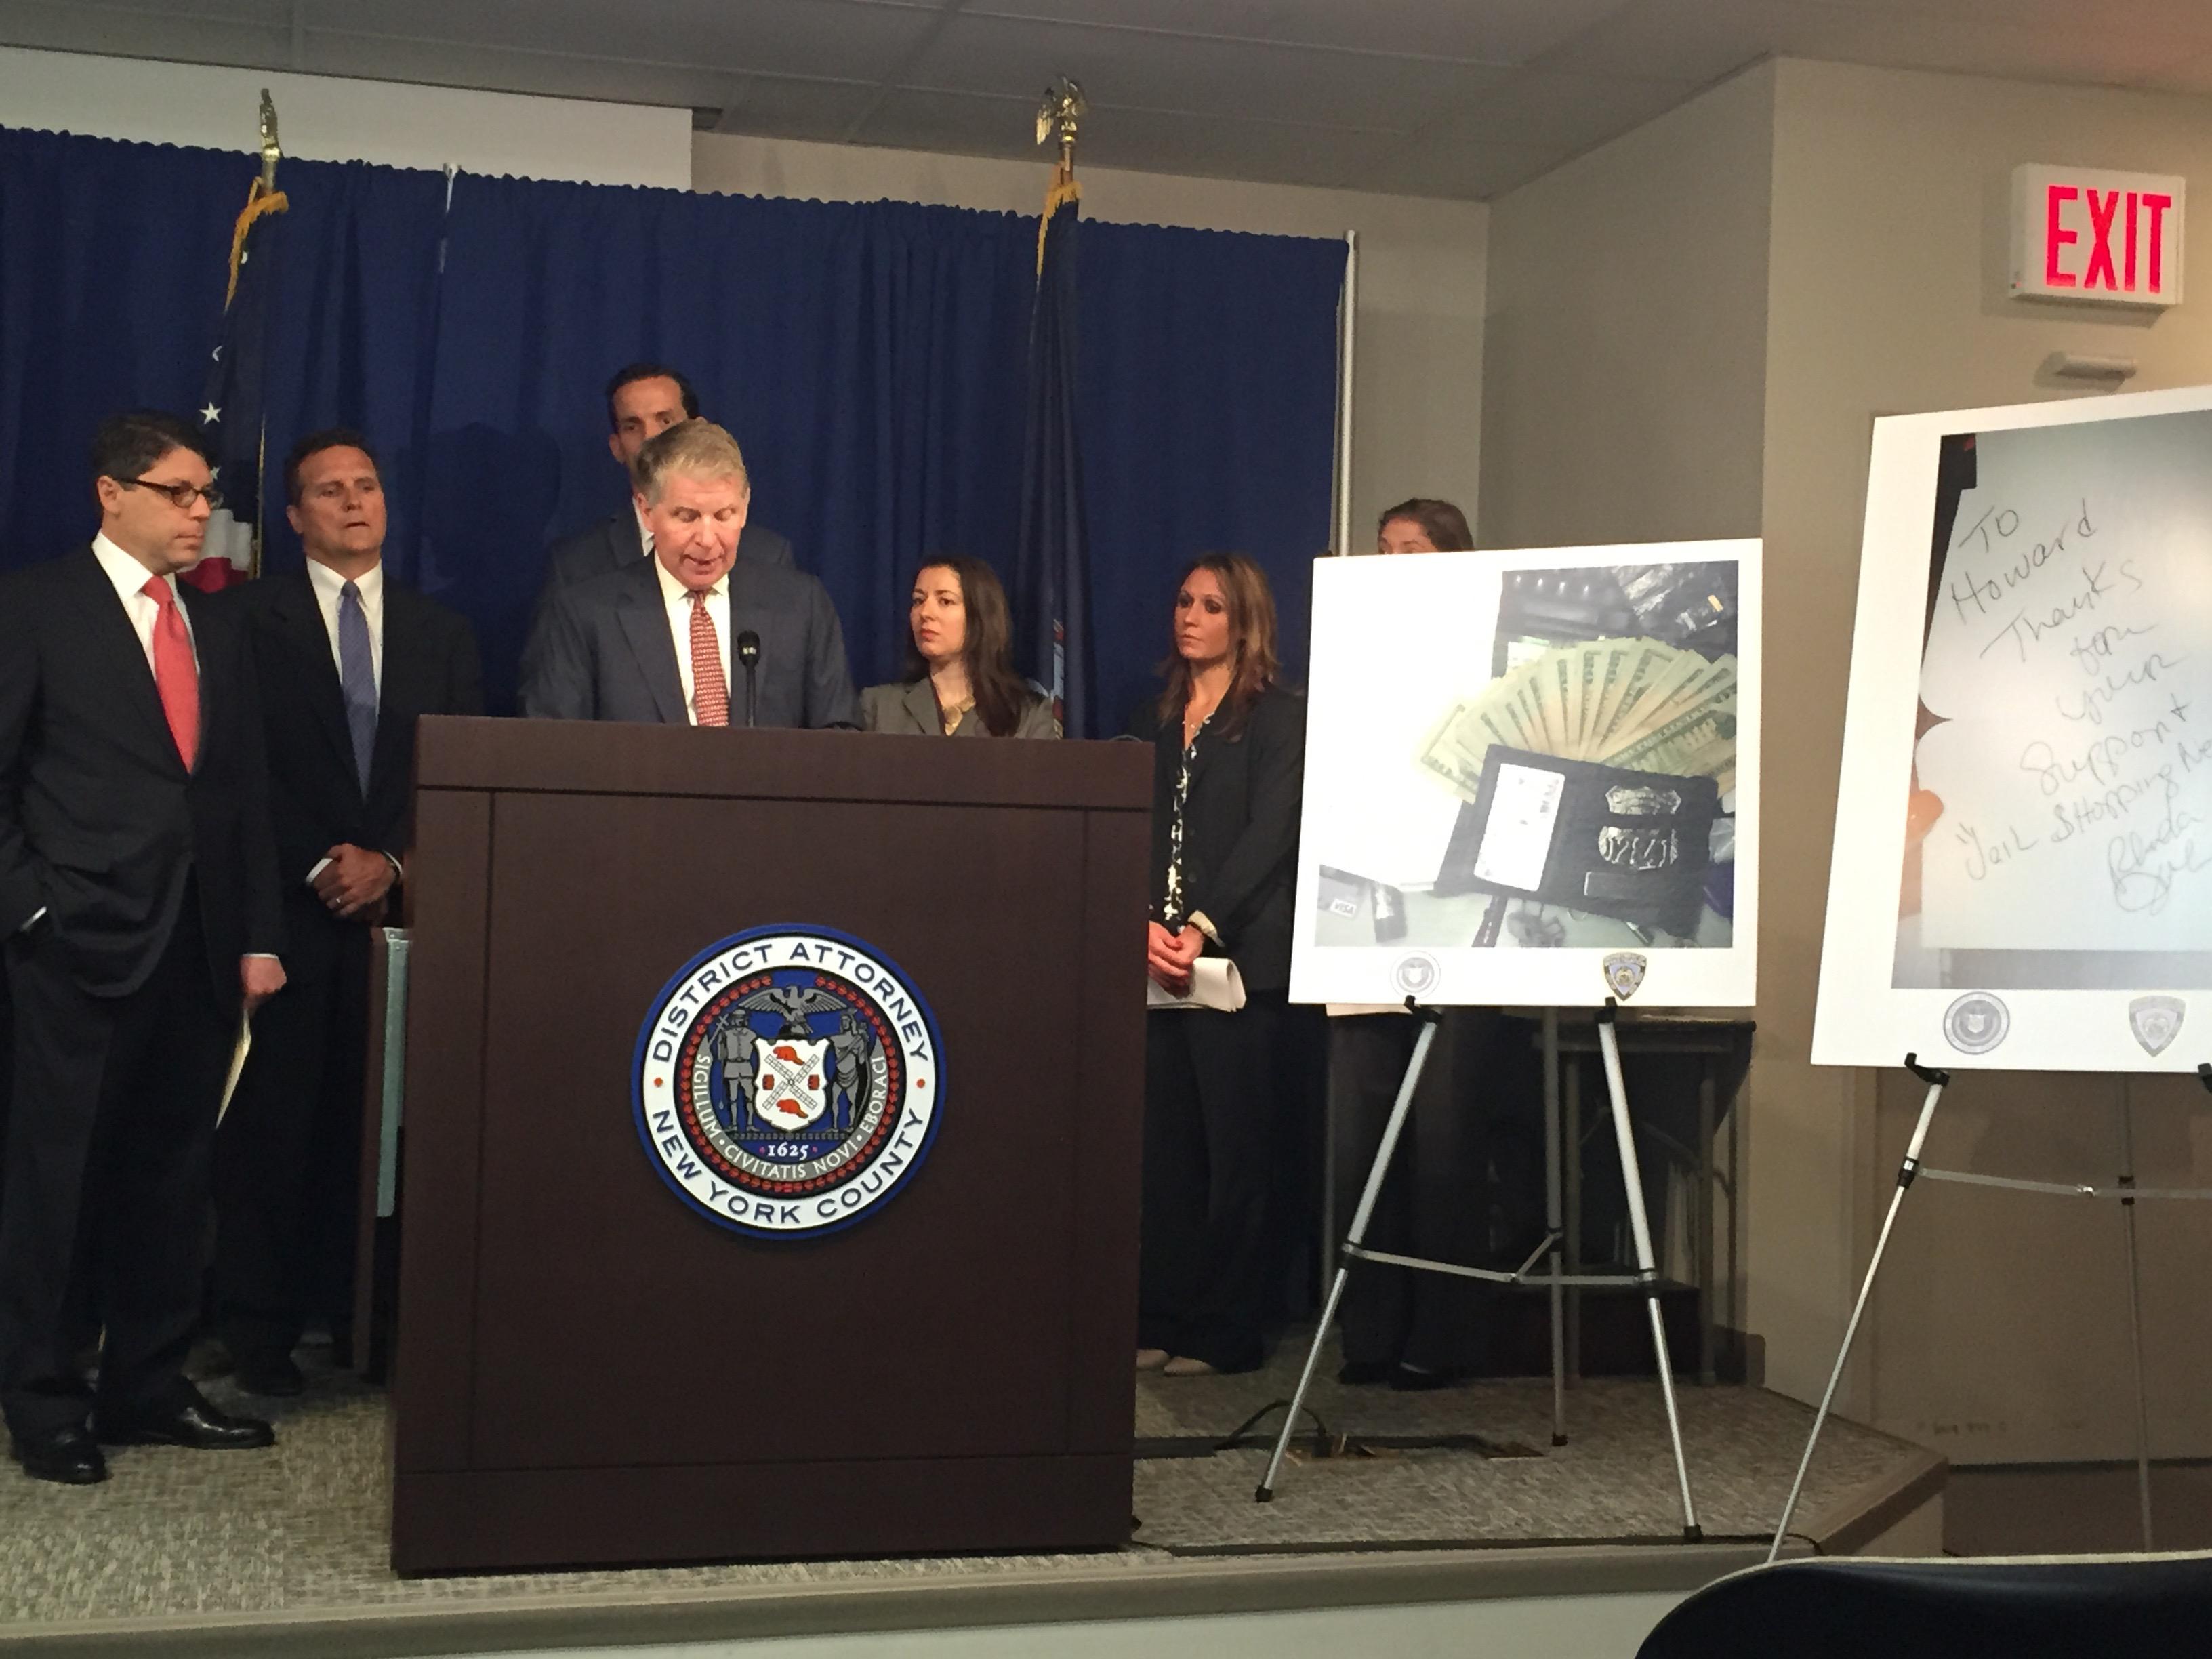 Manhattan D.A. Cyrus Vance Jr. speaks during a press conference today. (Photo: Jillian Jorgensen)